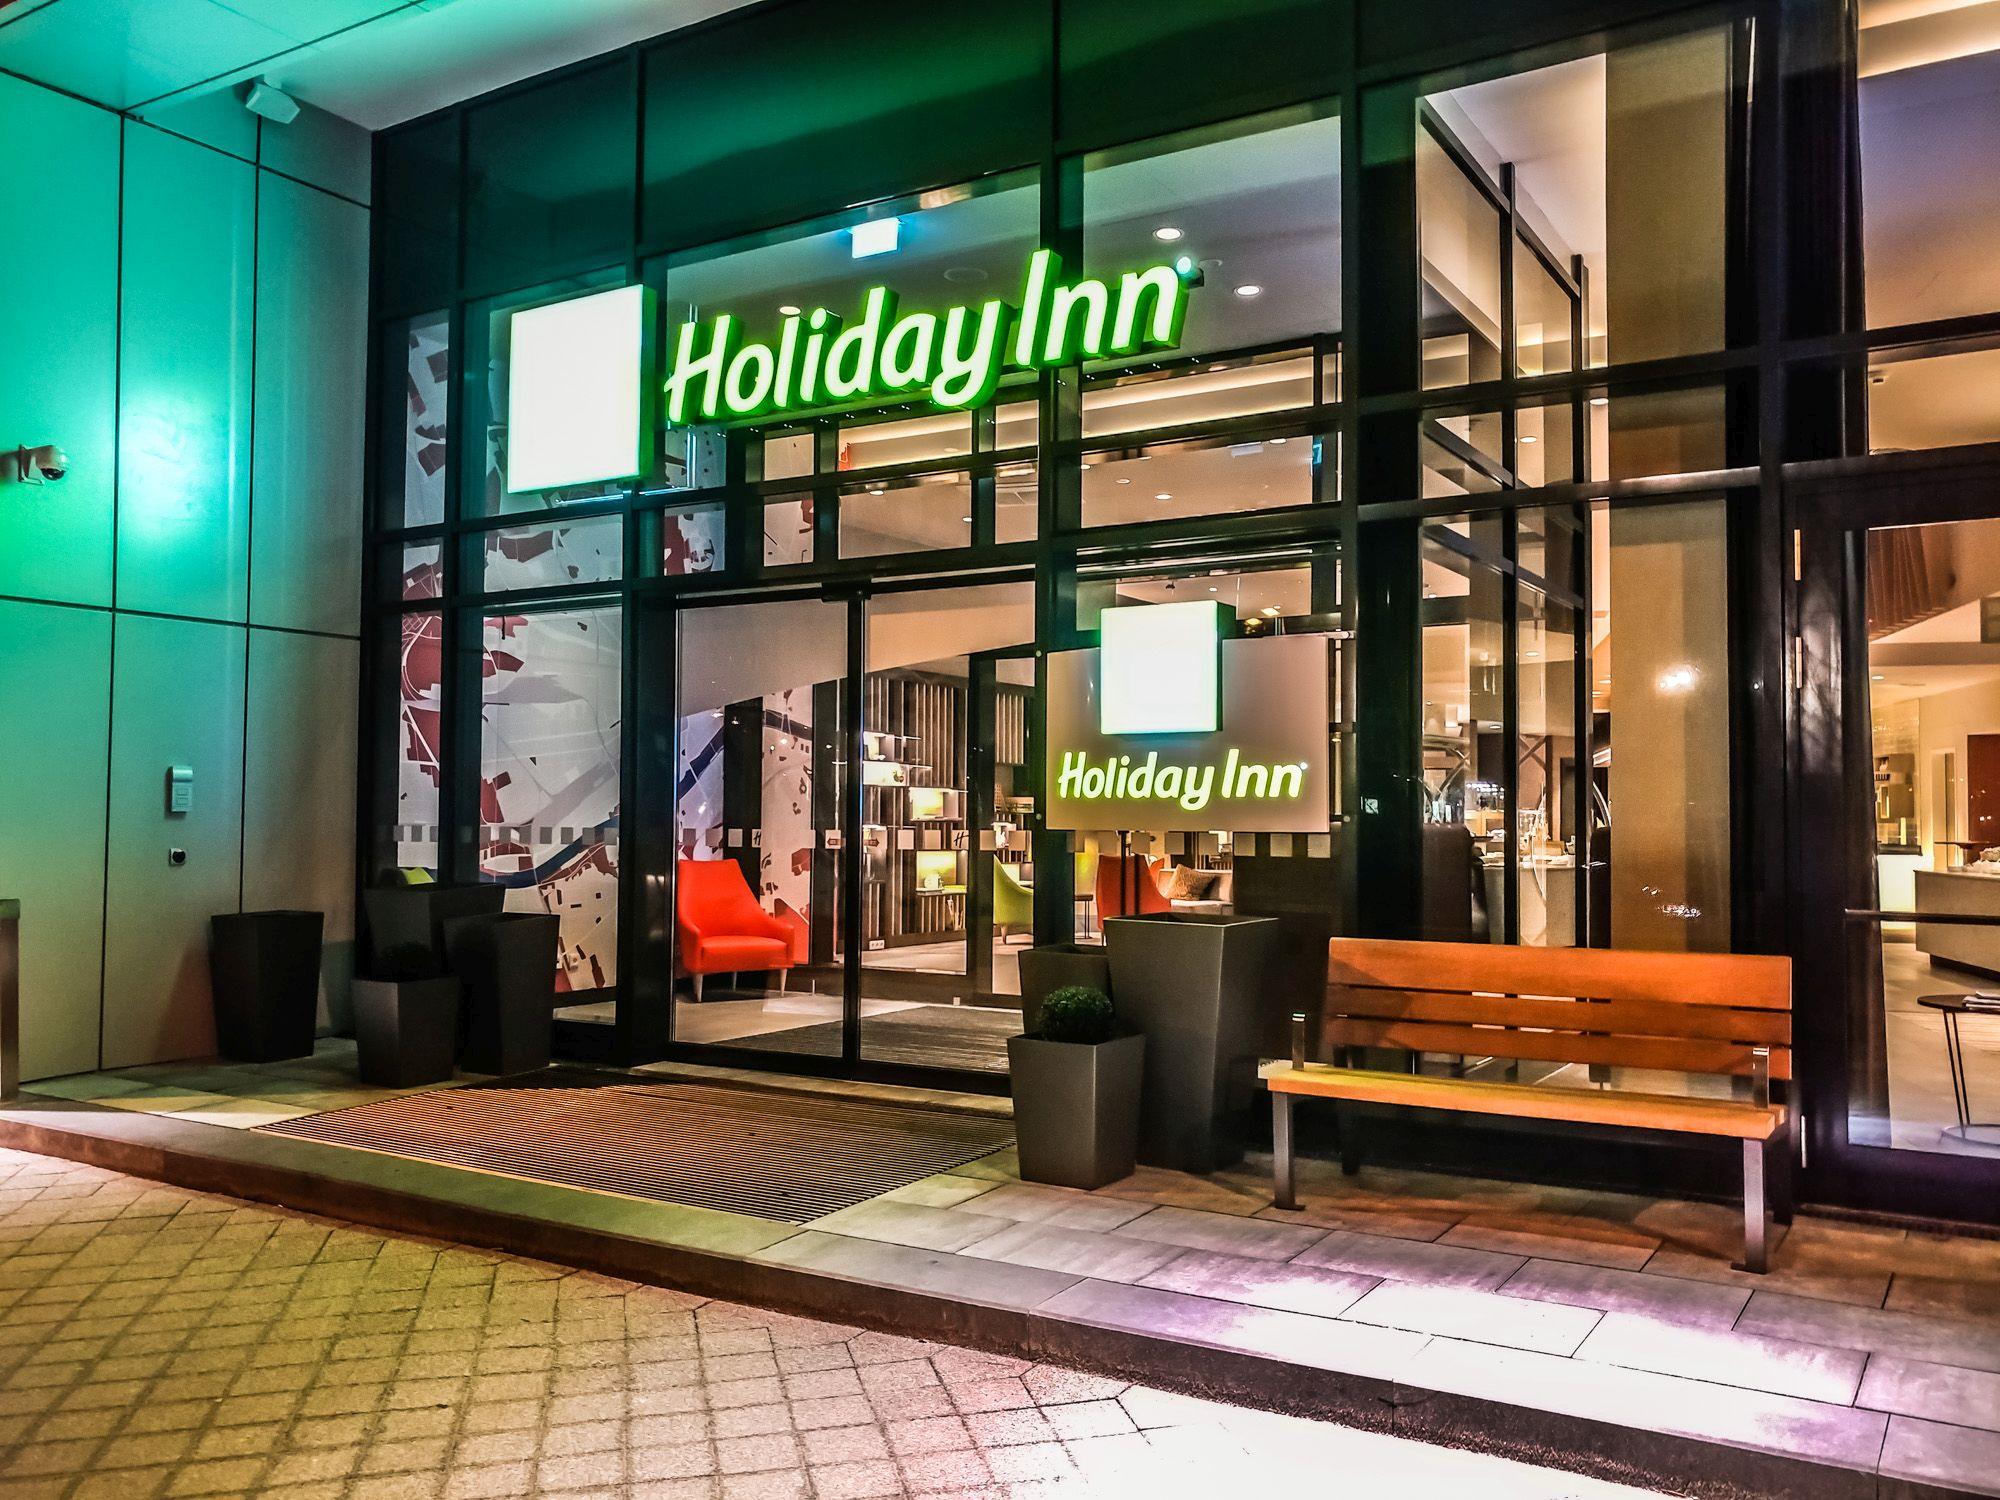 Hotel Review: Holiday Inn Frankfurt Airport – Executive King Room